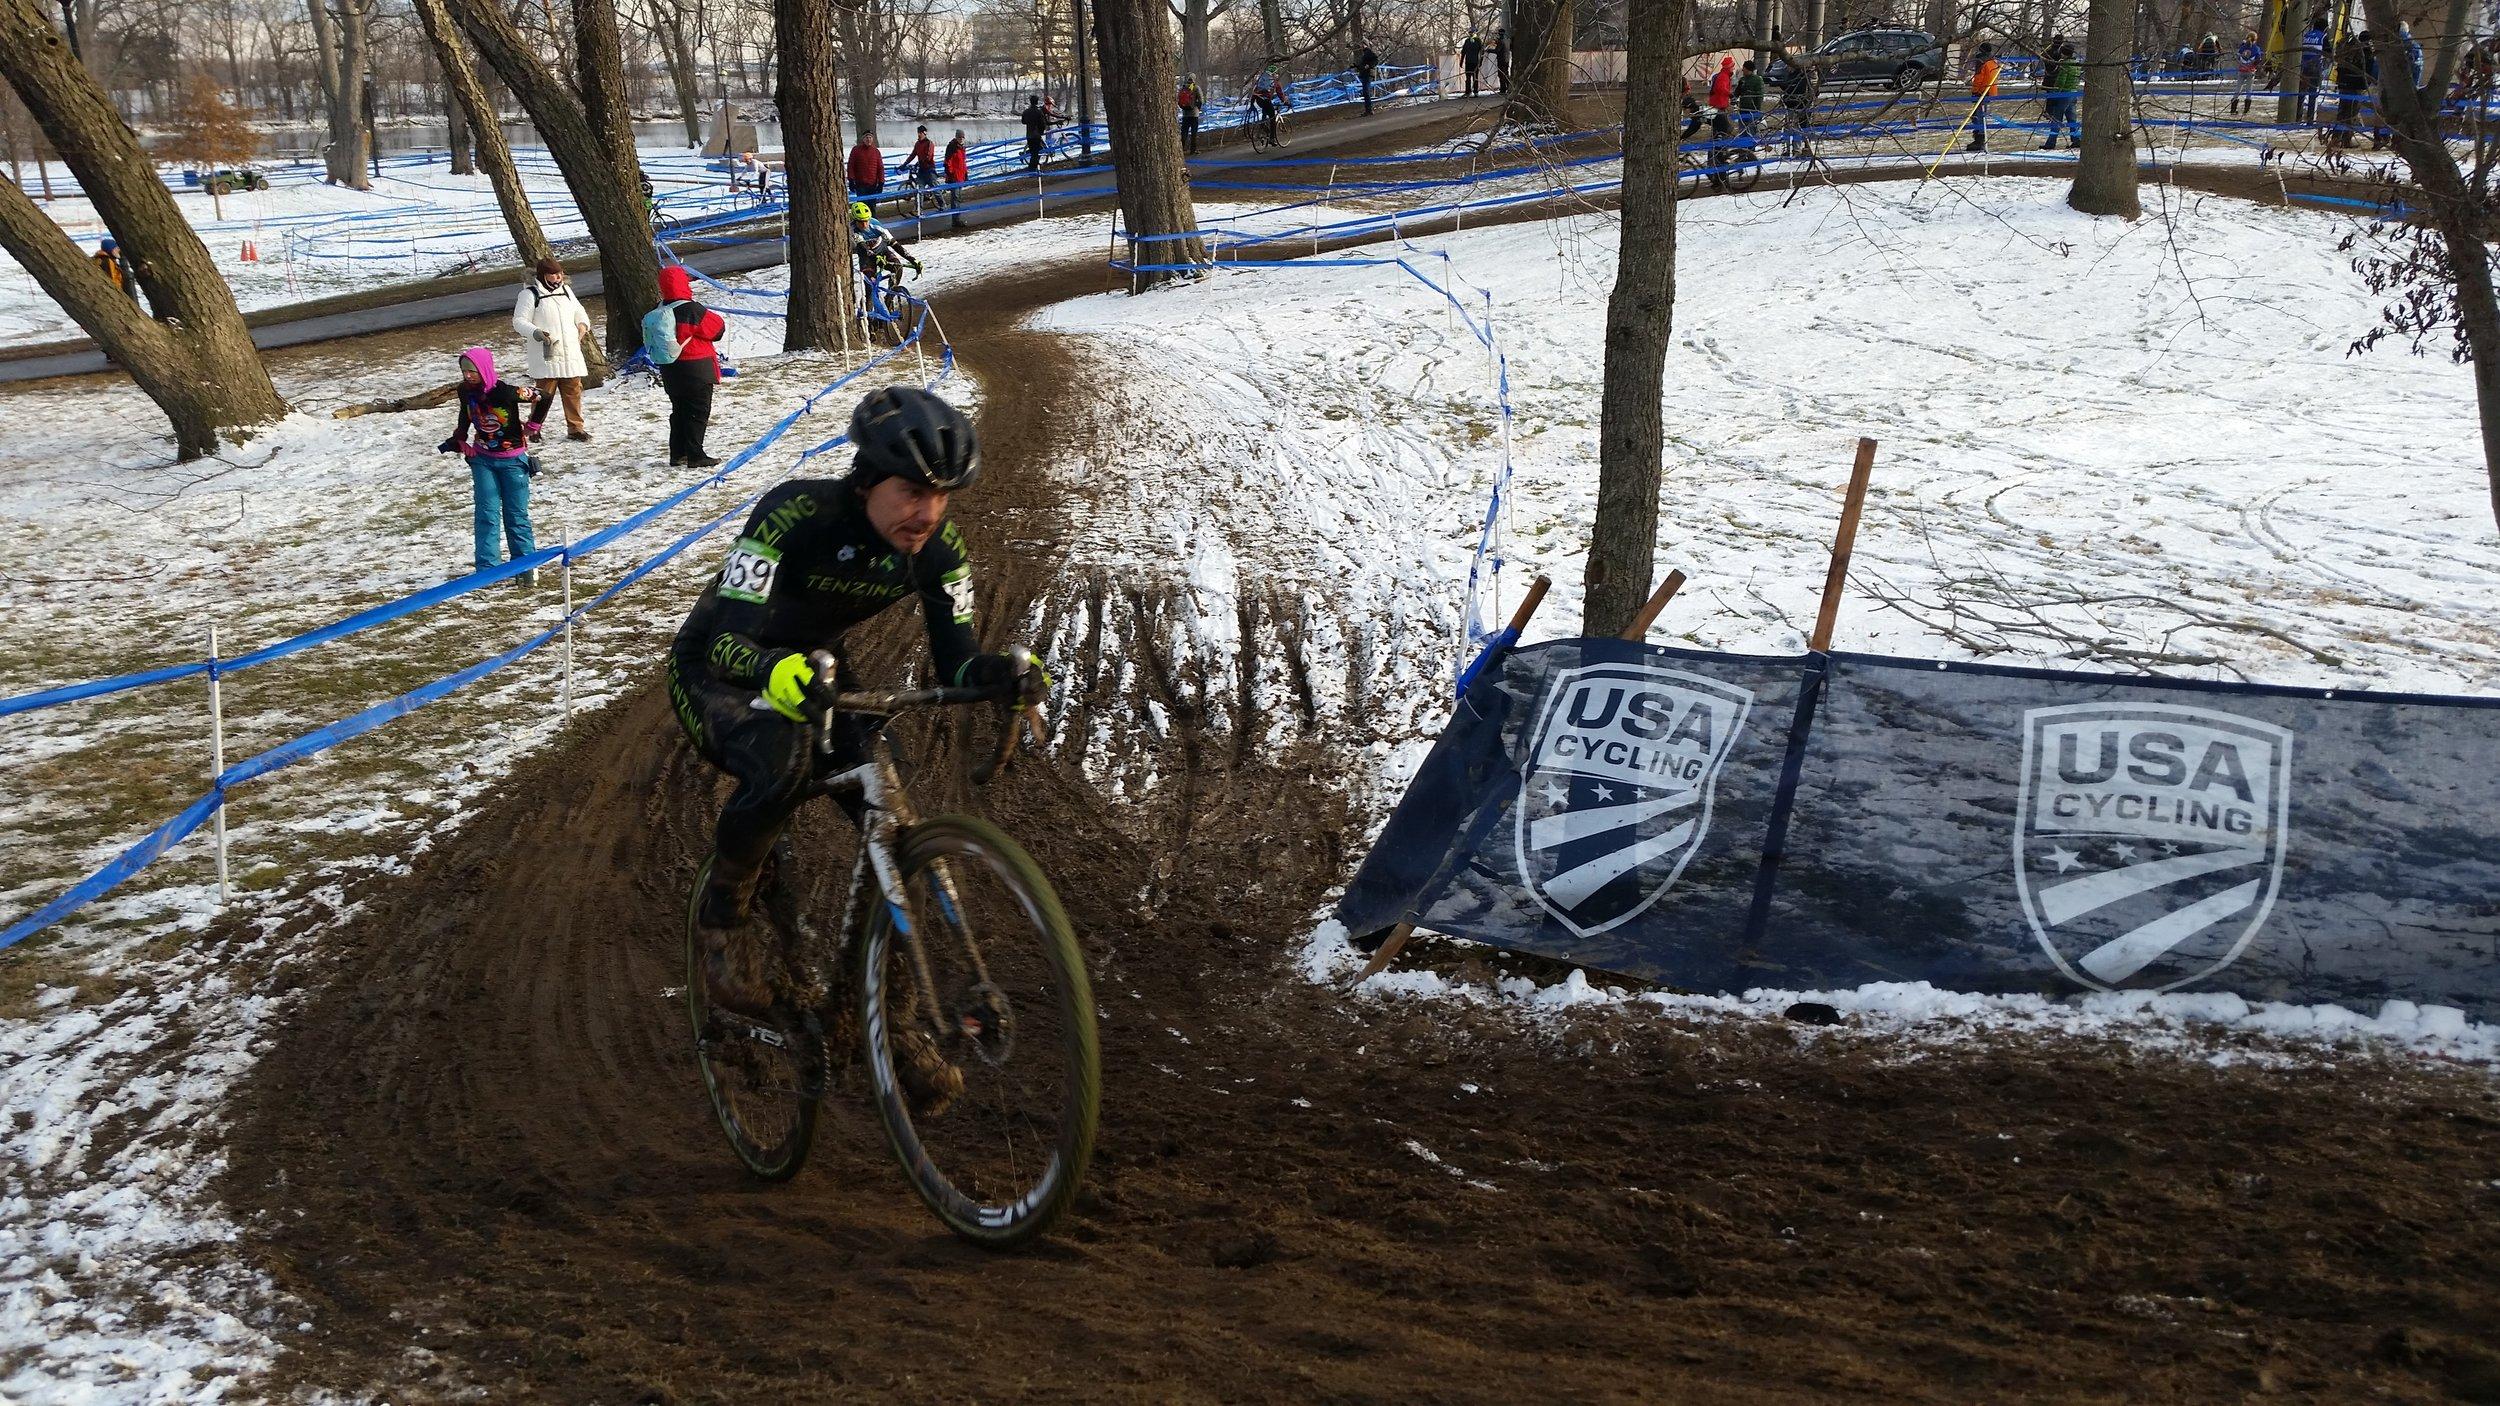 Mark Rawlings sliding through the mud